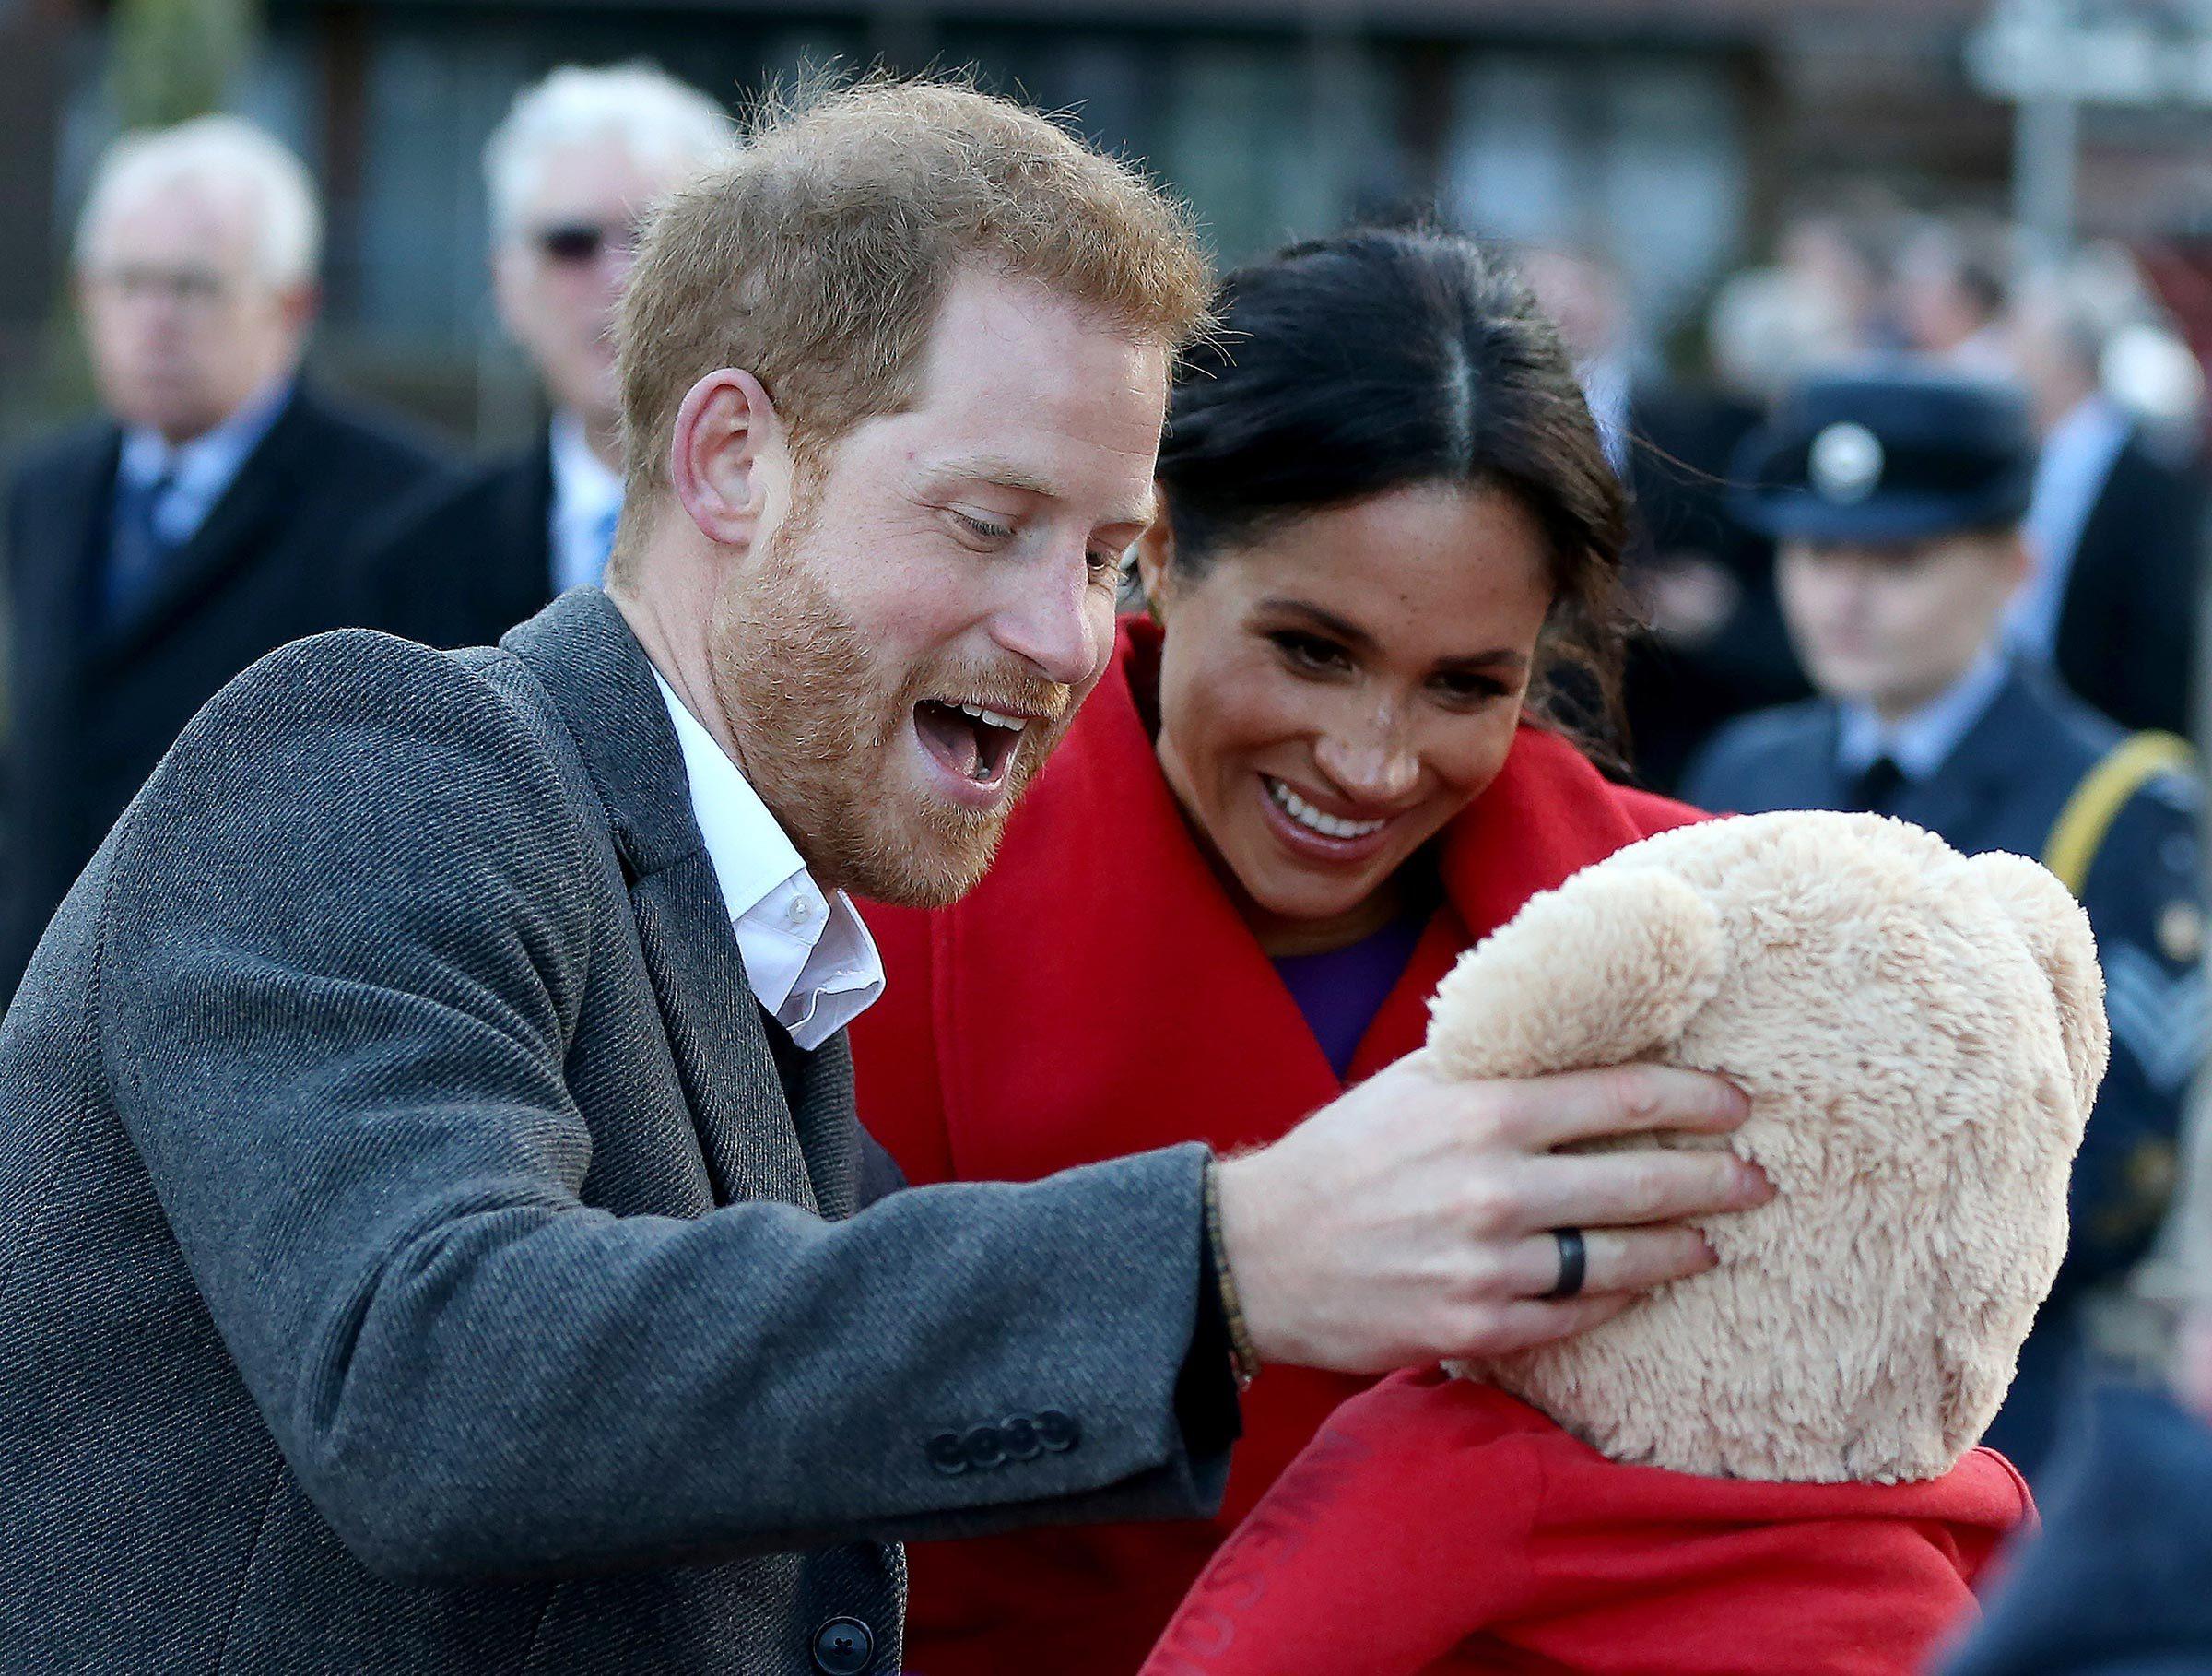 Prince Harry and Duchess of Sussex visit Birkenhead, United Kingdom - 14 Jan 2019